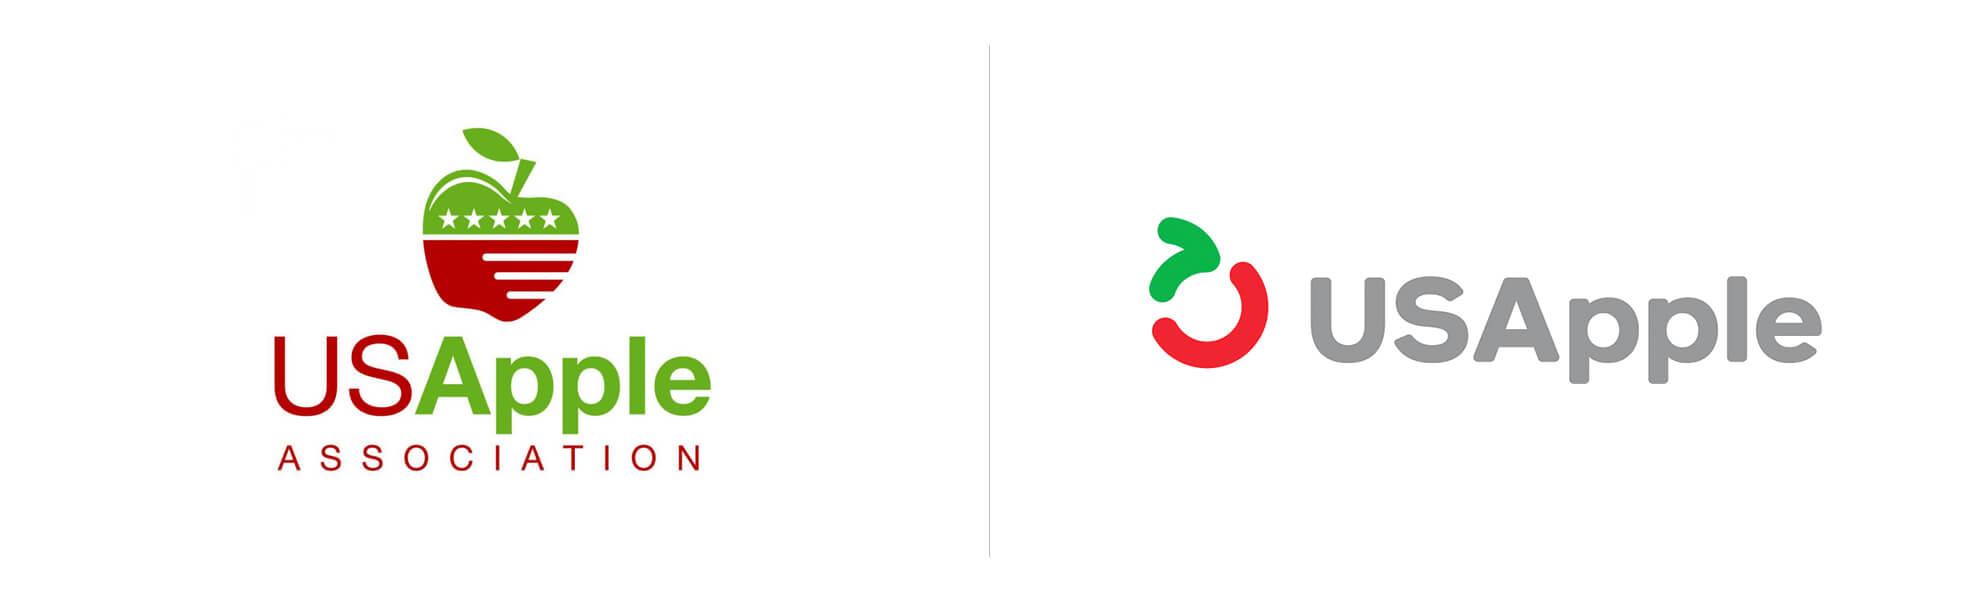 USApple nowe istare logo